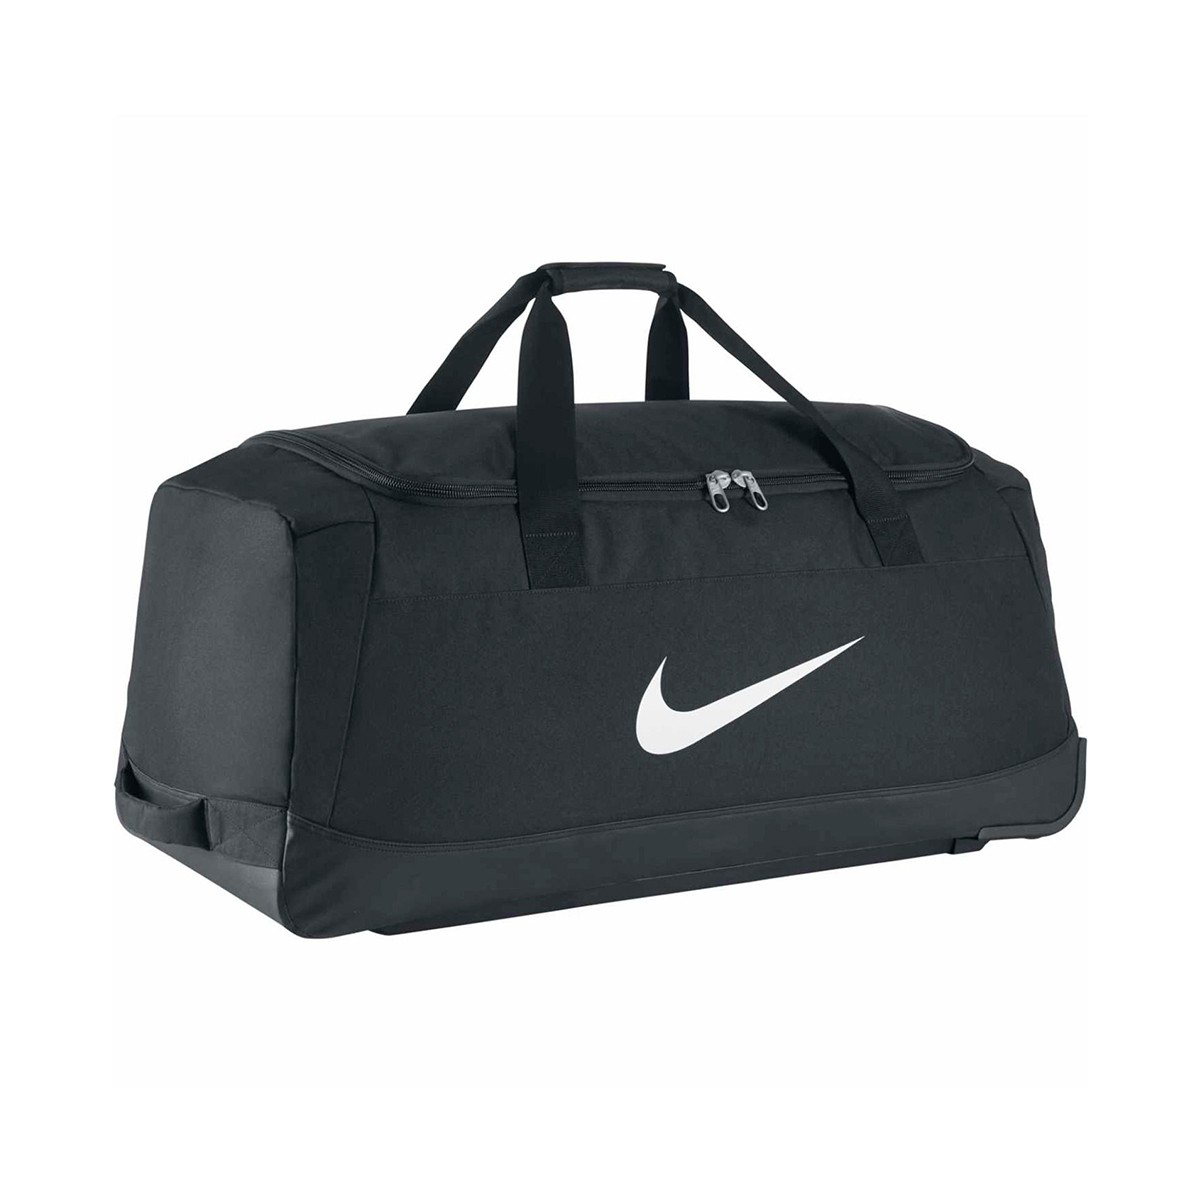 tarta montar Descomponer  Bag Nike Club Team Roller Black - Football store Fútbol Emotion